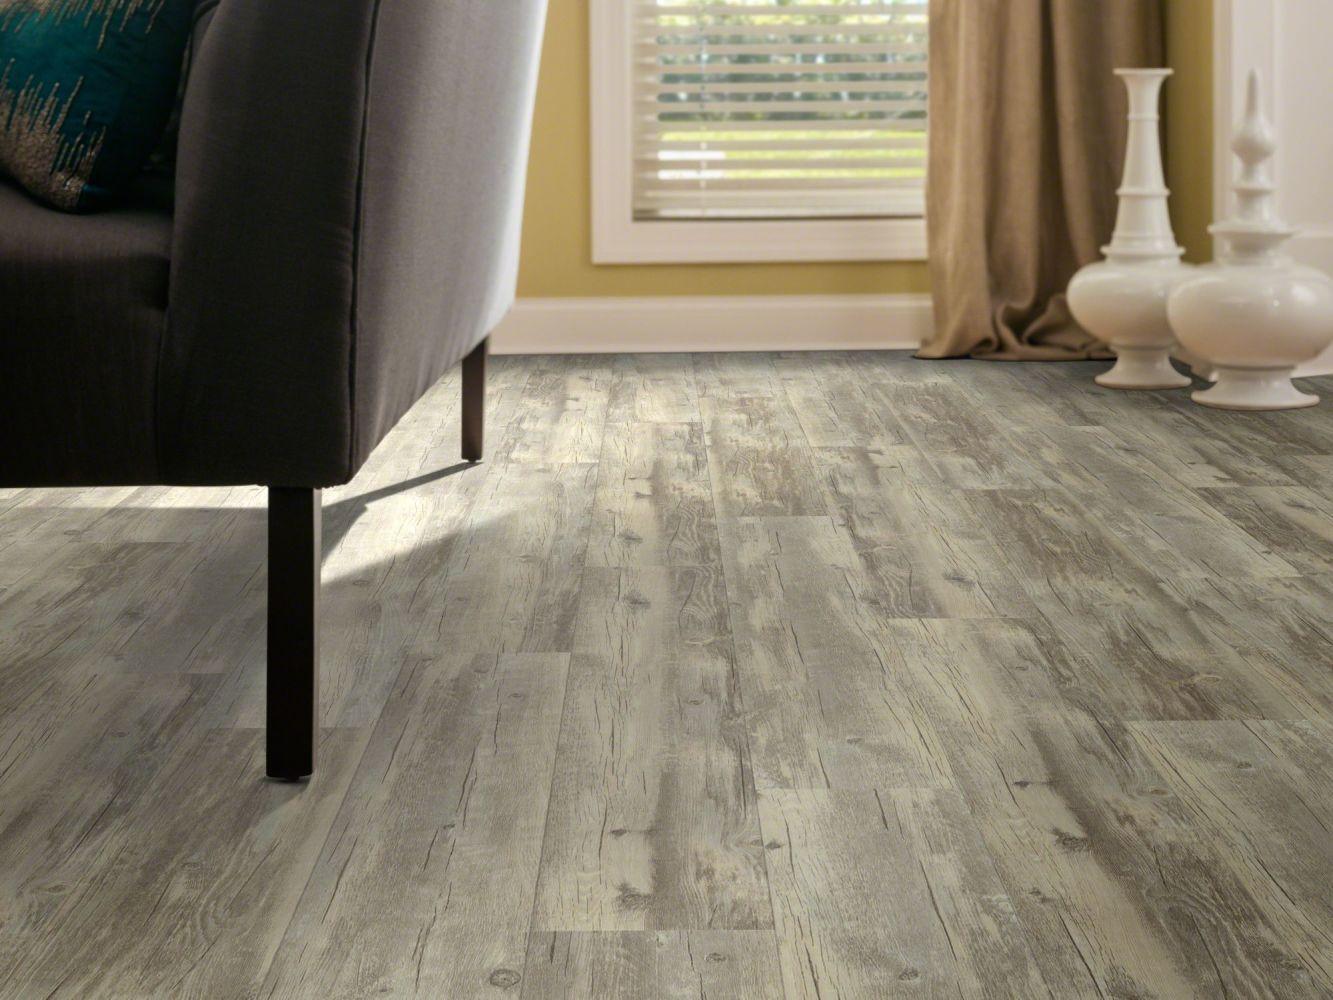 Shaw Floors Dr Horton Ballantyne Plus Click Wheat Oak 00507_DR036